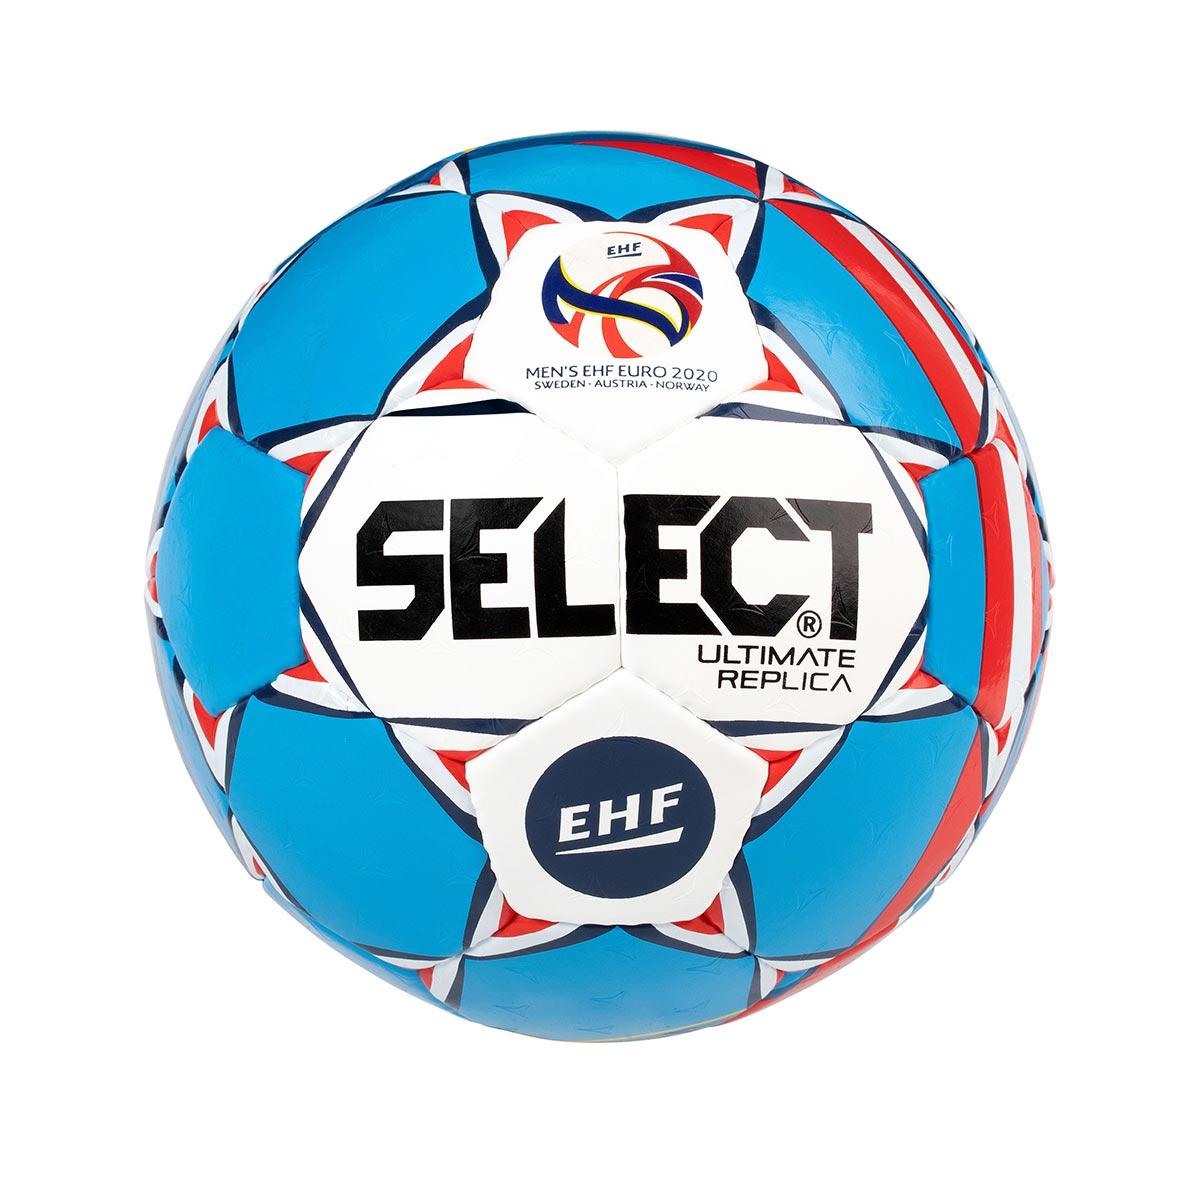 Ballon Select Réplica Officiel Ultimate Championnat Europe Handball 2020 EHF